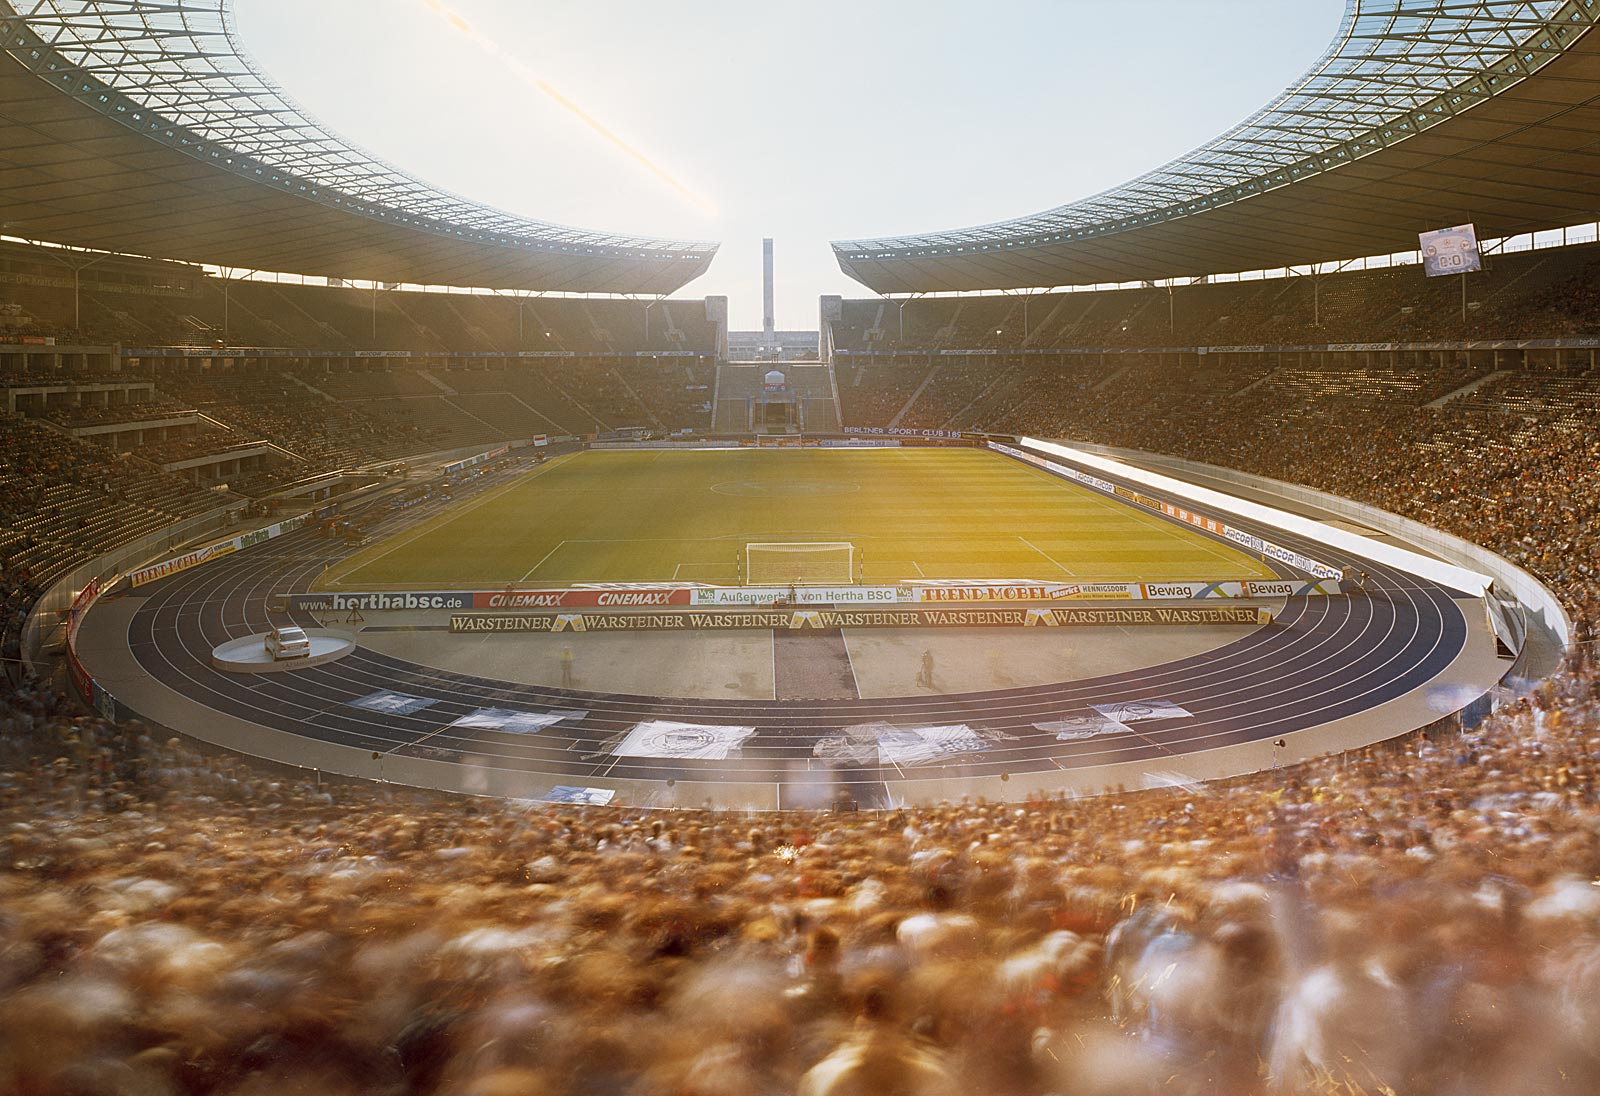 Hertha BSC Berlin - DSC Arminia Bielefeld, Olympiastadion Berlin (15.30 - 17.20 Uhr, 19.3.2005)